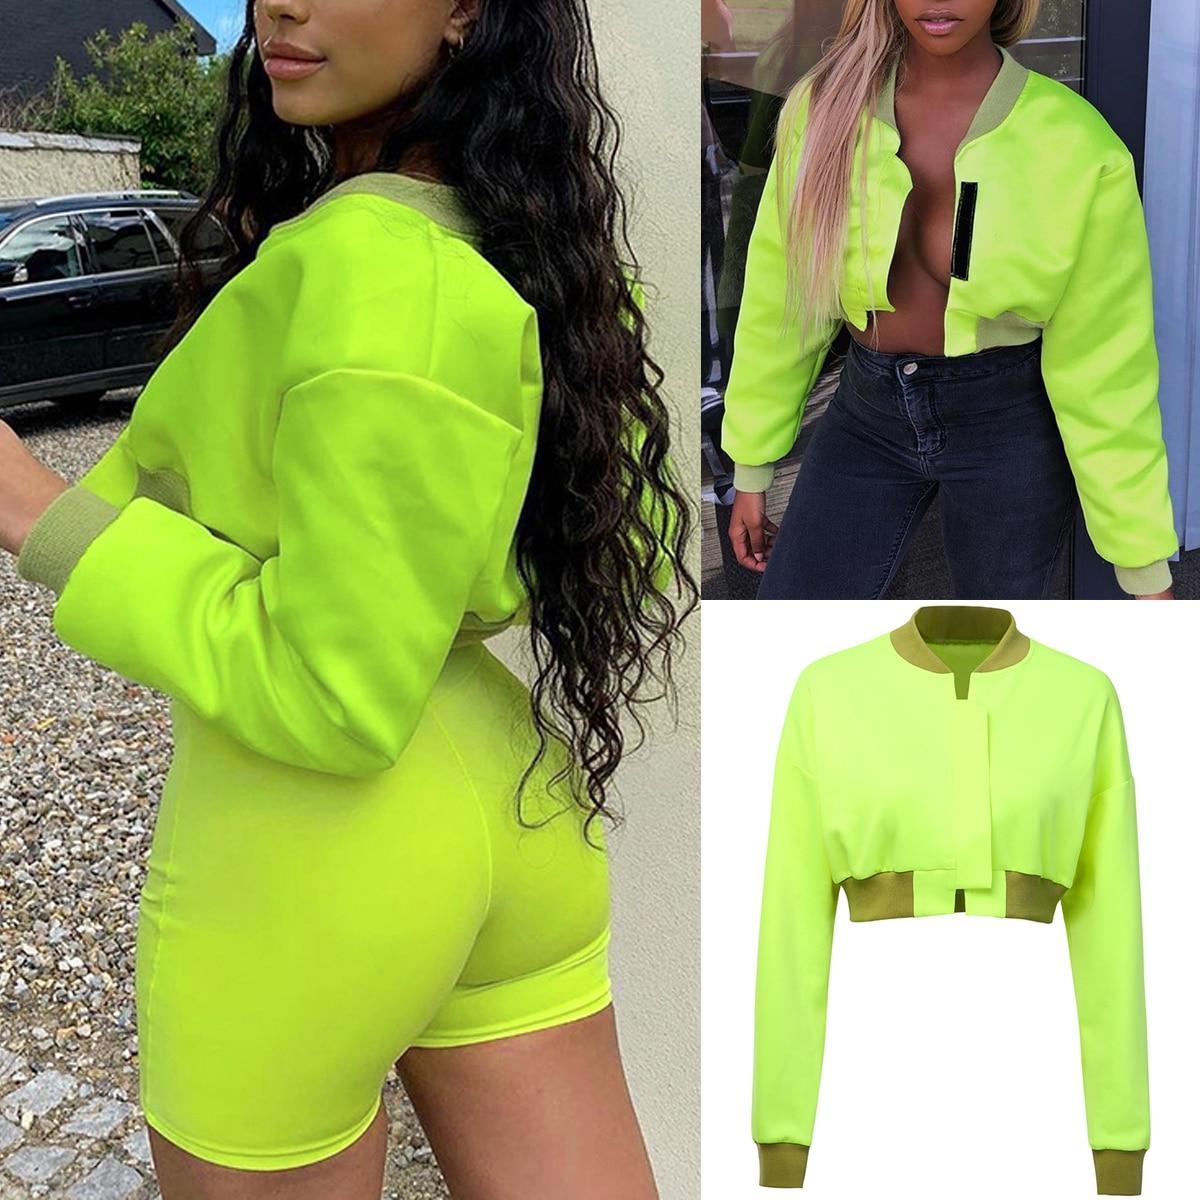 Hbfe0988f4d3043f8a4d04af5361eb555k Neon Green Cropped Jacket Women Streetwear Outwear Windbreaker Bomber Baseball Coats and Jackets Autumn 2019